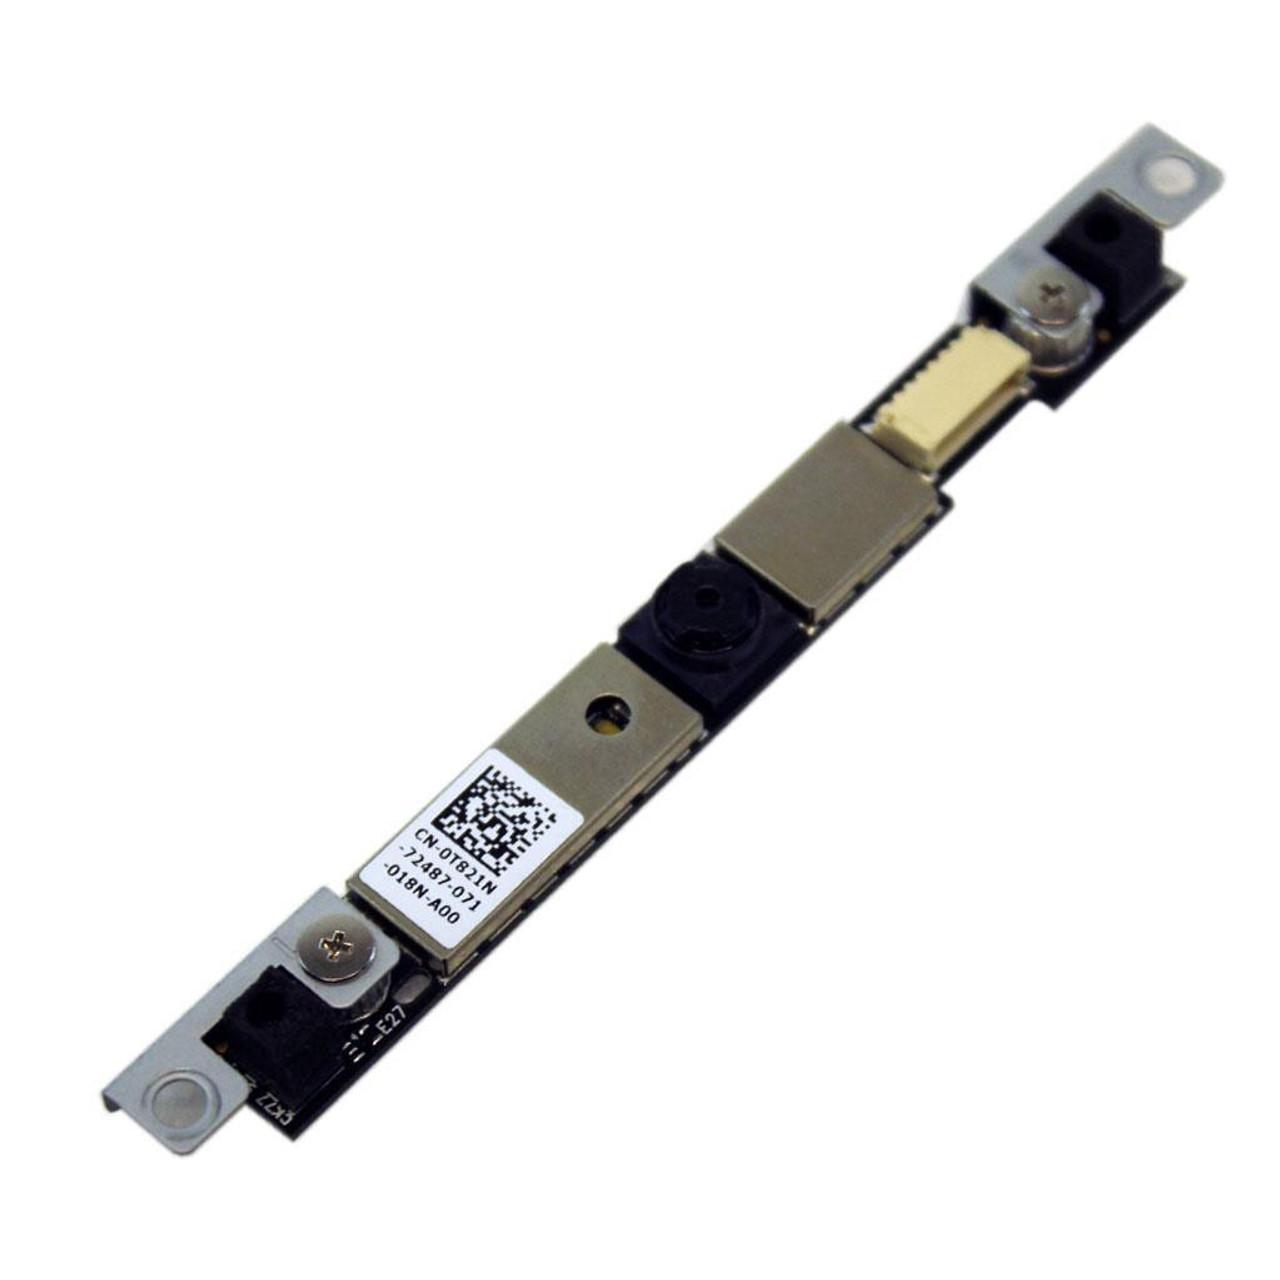 Dell Studio 1457 / 1458 Laptop Webcam - T821N